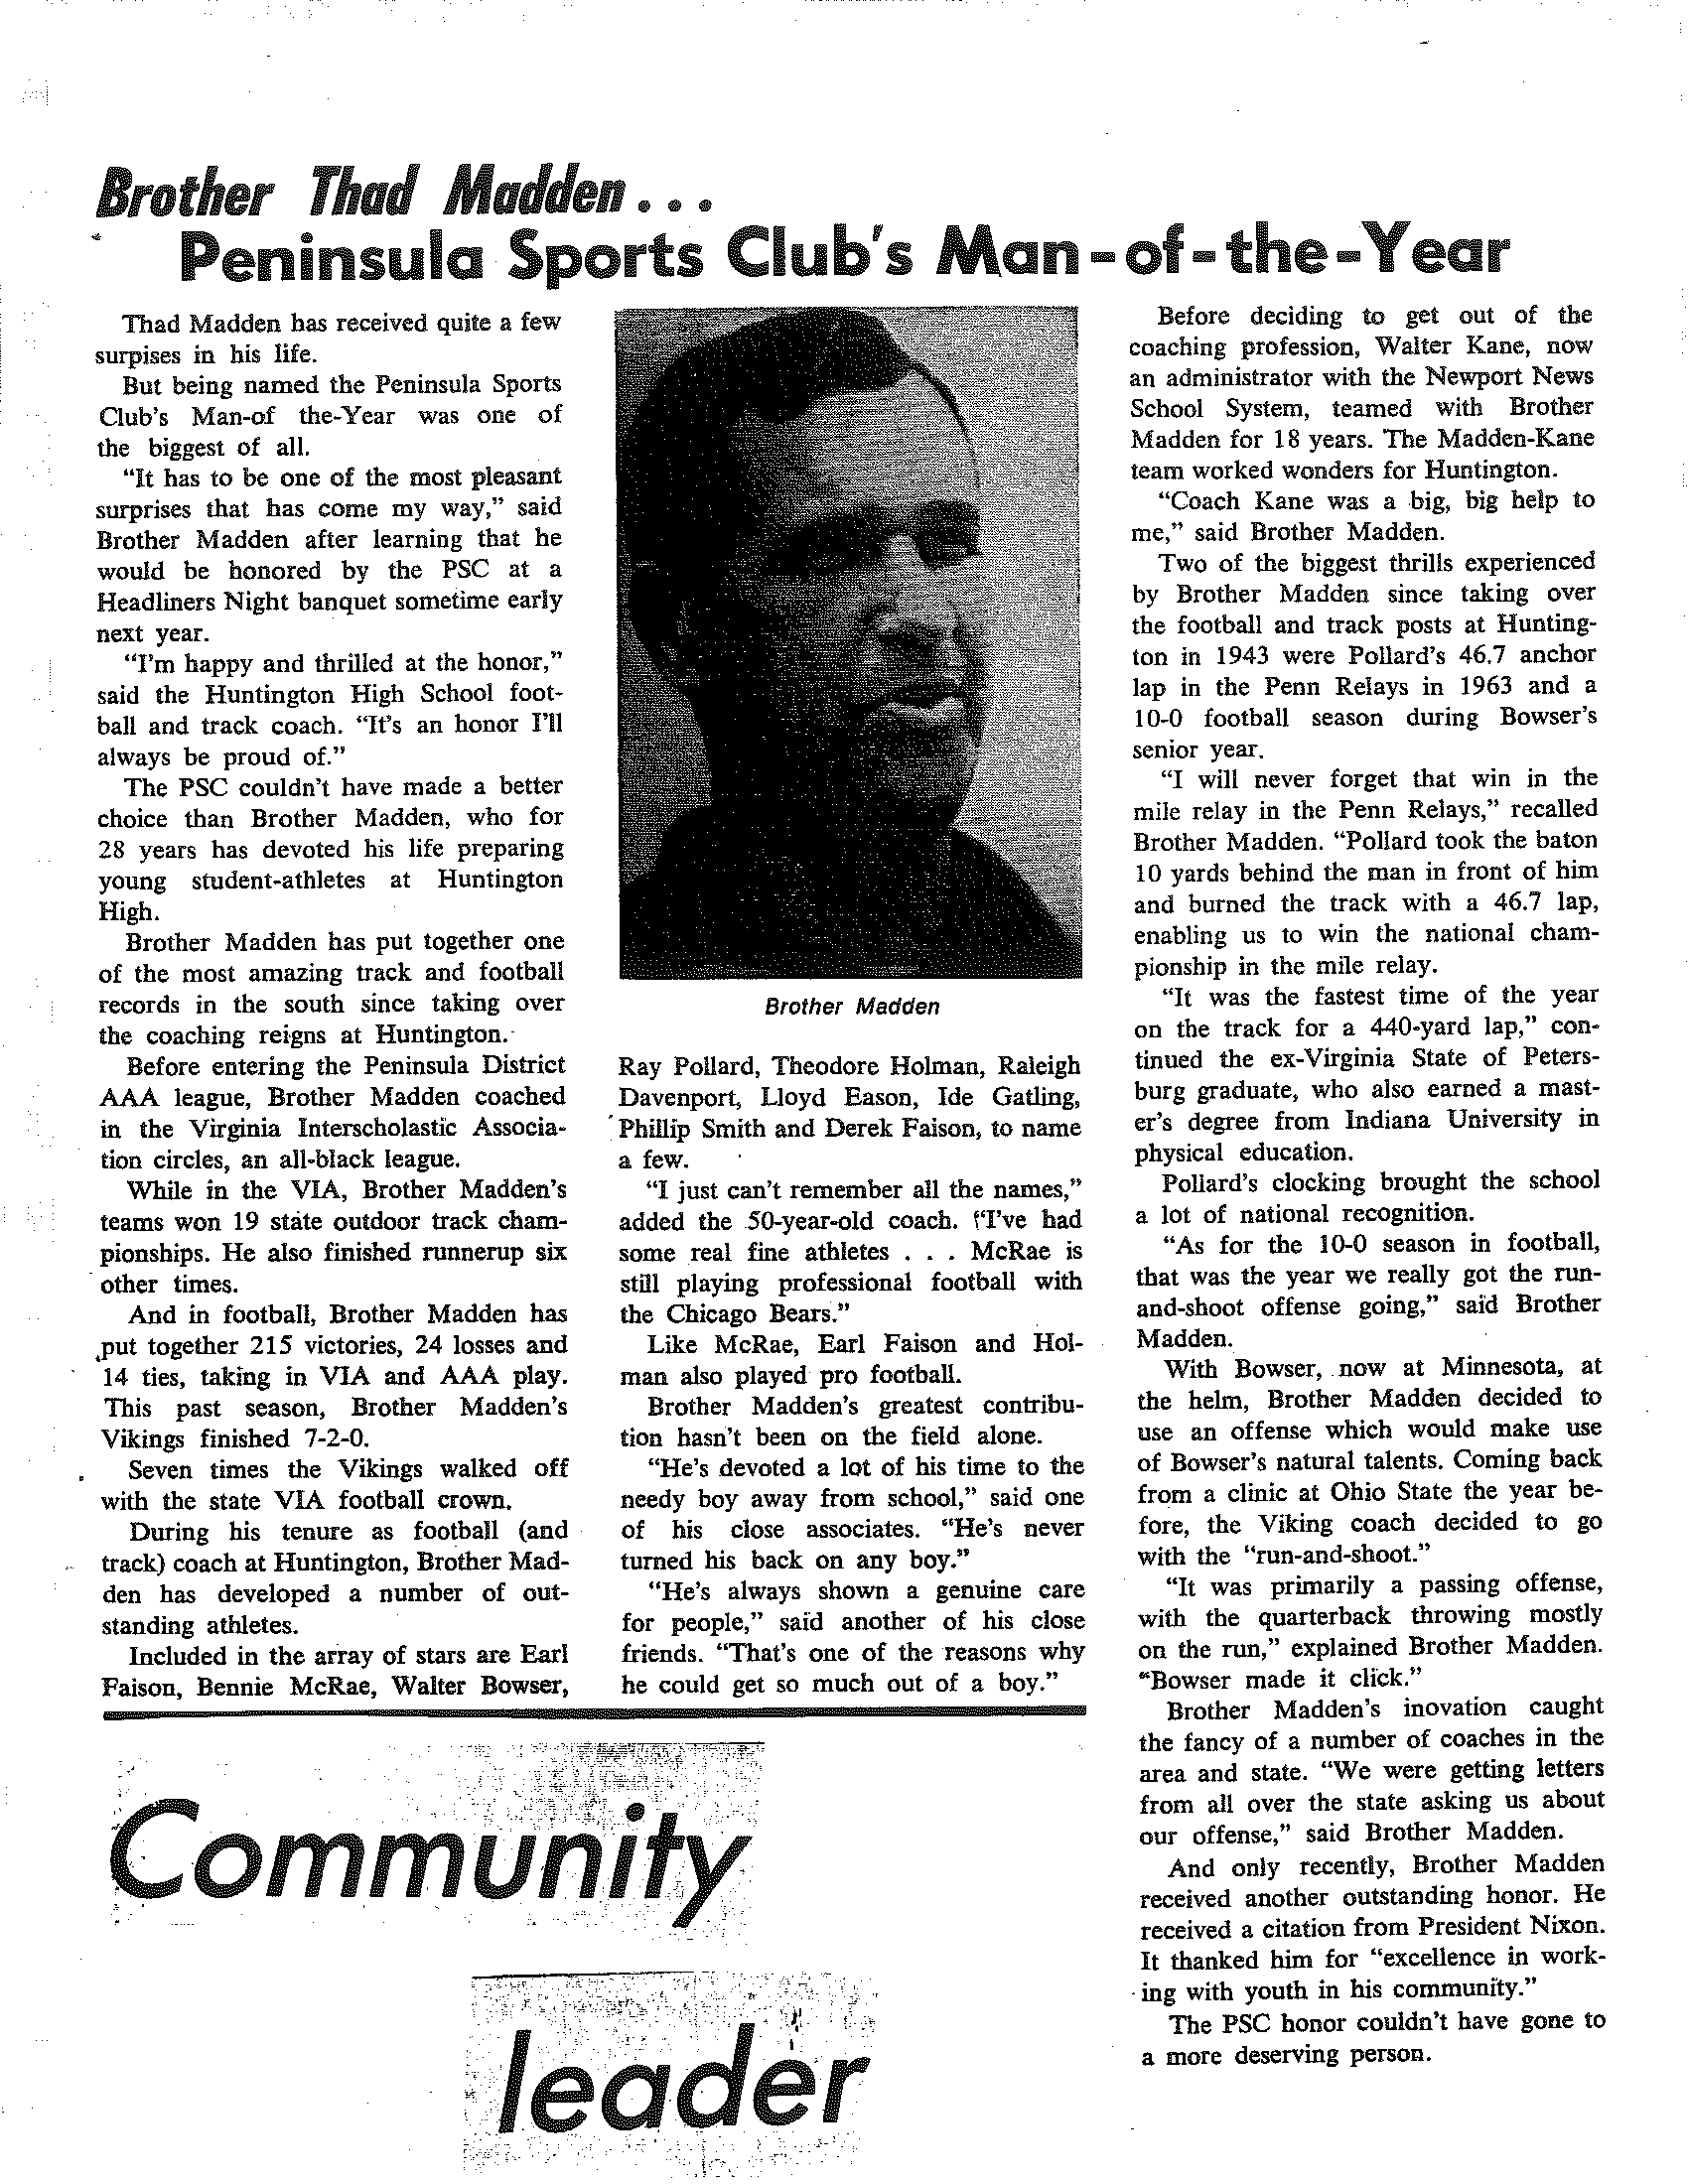 Zeta Lambda 1971 - Peninsula Sports Club Man of the Year, Bro. Thad Madden.png